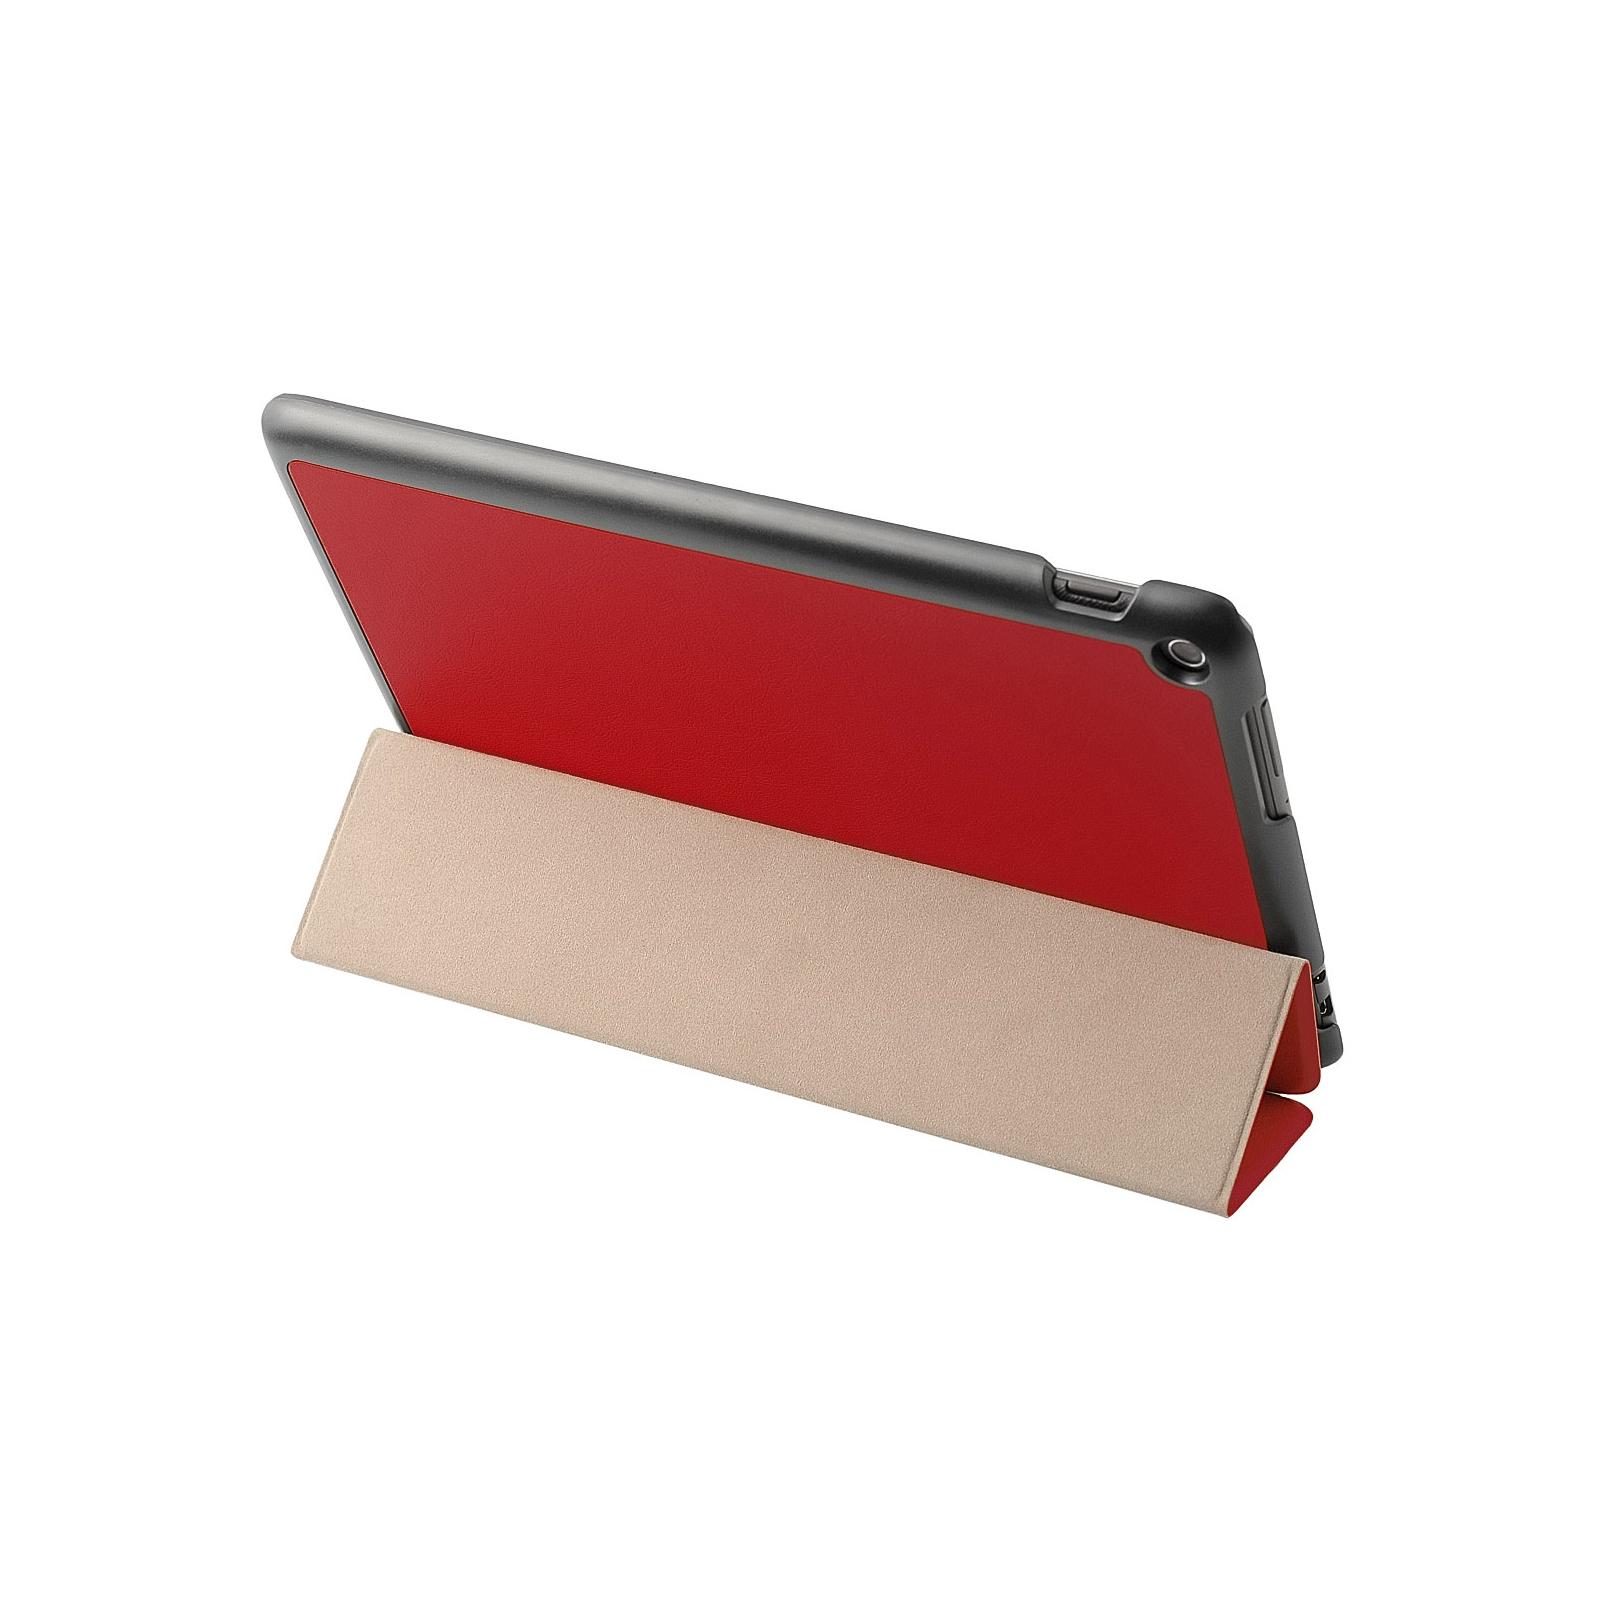 Чехол для планшета Grand-X ASUS ZenPad 10 Z300/Z300C Red (ATC - AZPZ300R) изображение 6